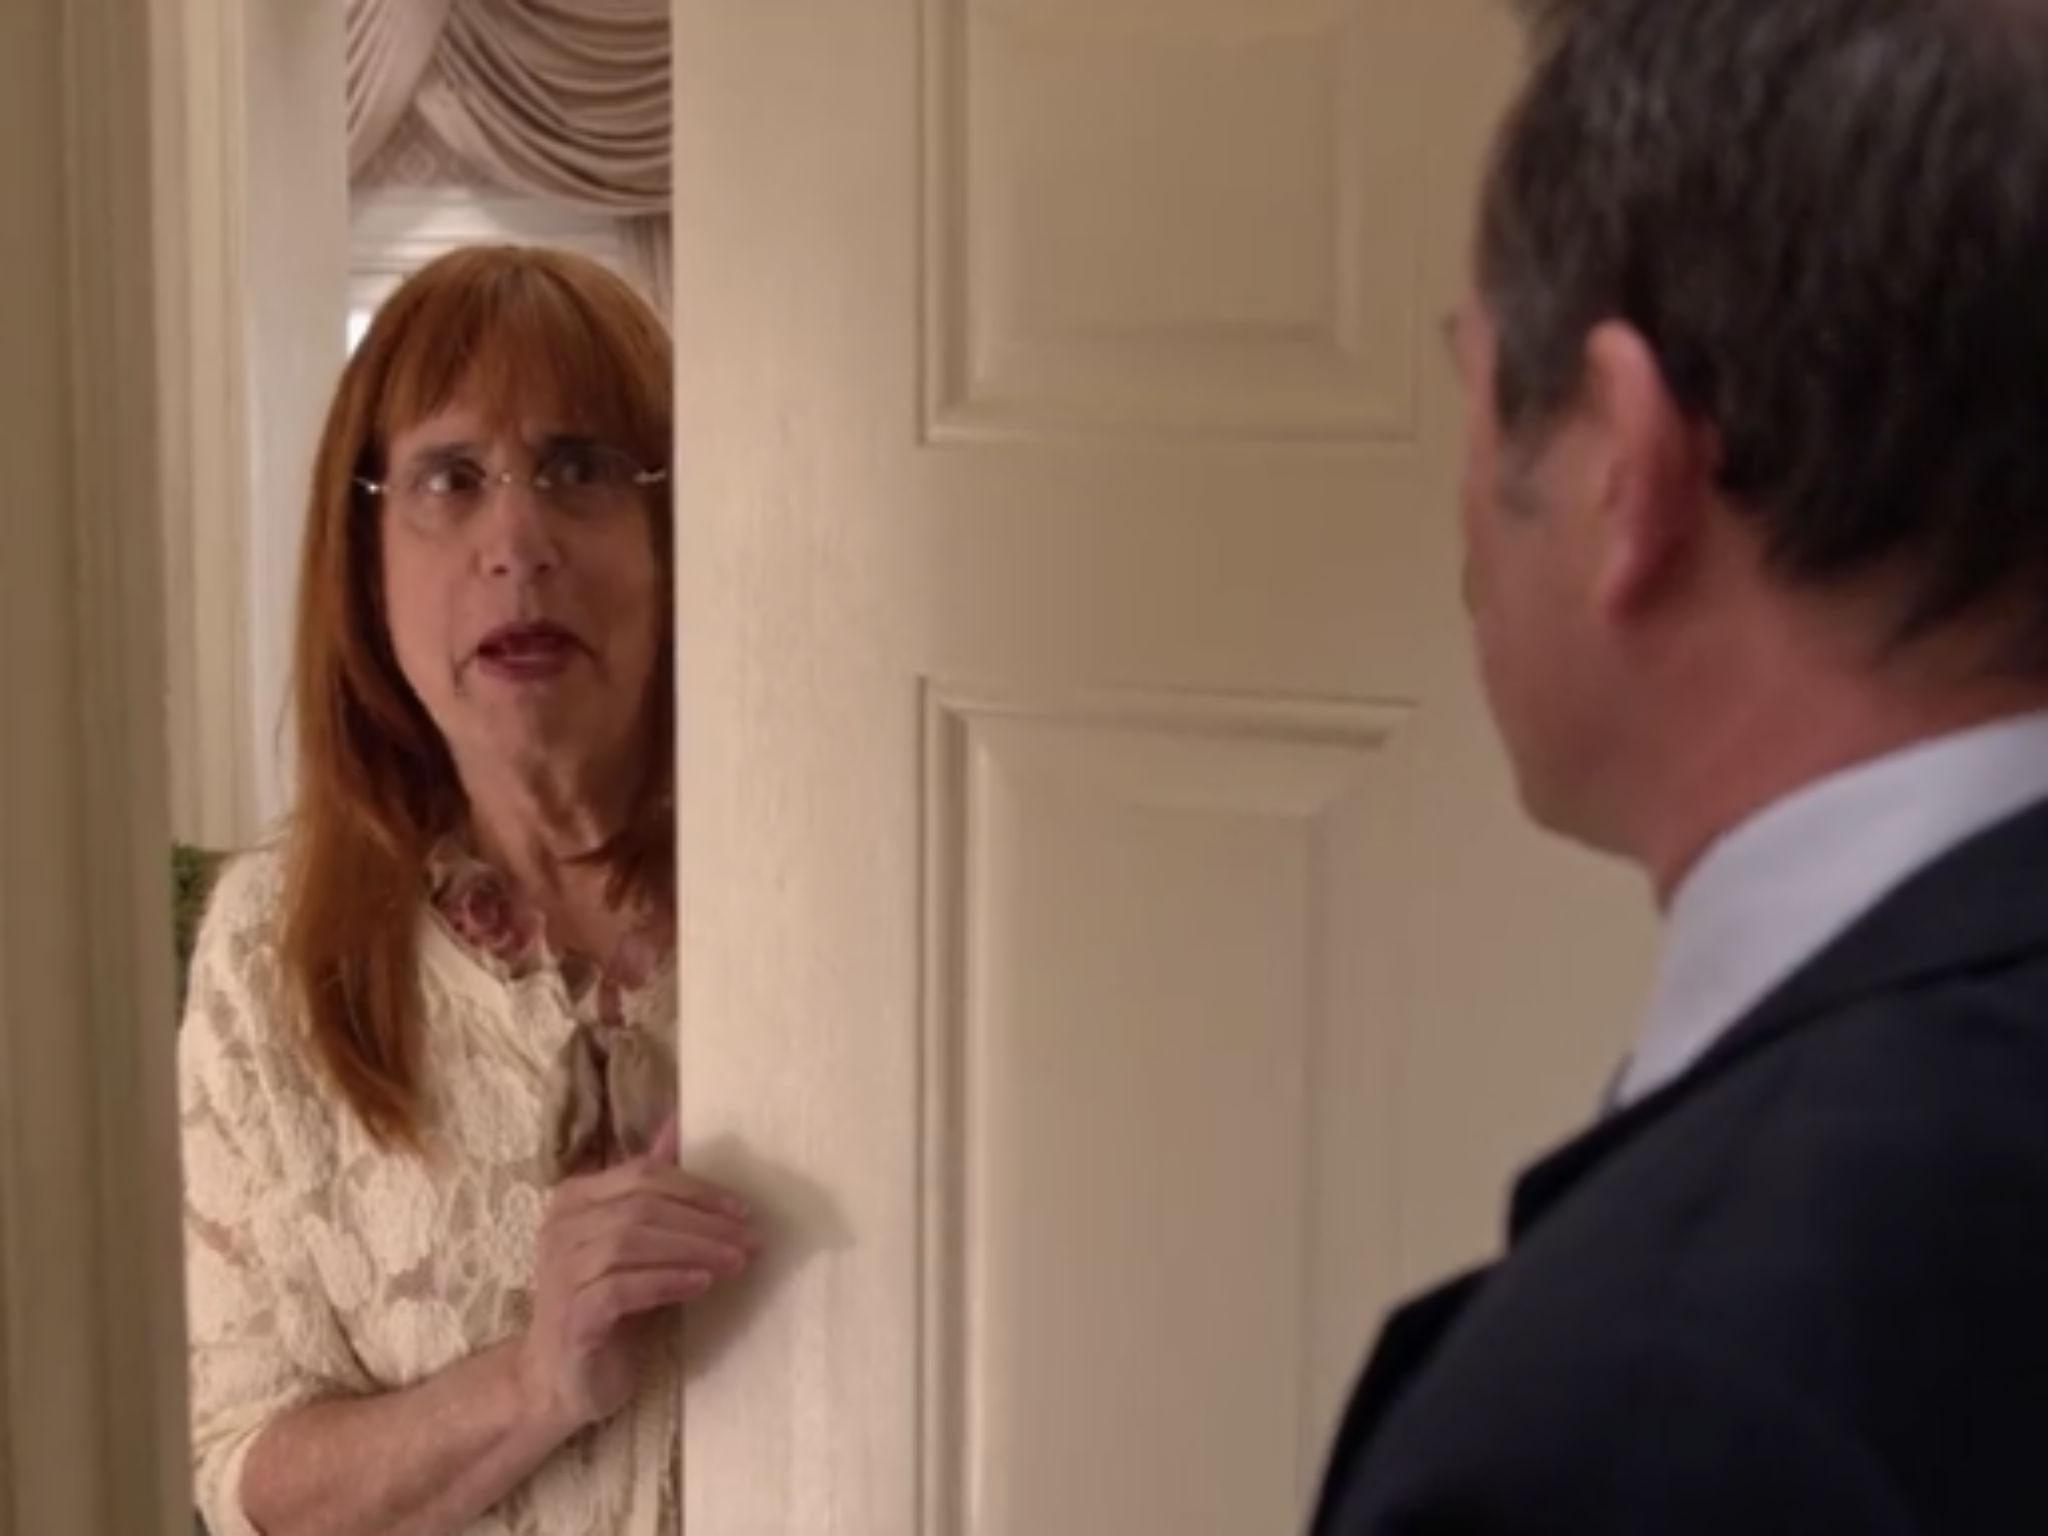 Arrested Development season 5 features Transparent joke deemed 'awkward' in wake of Jeffrey Tambor allegations